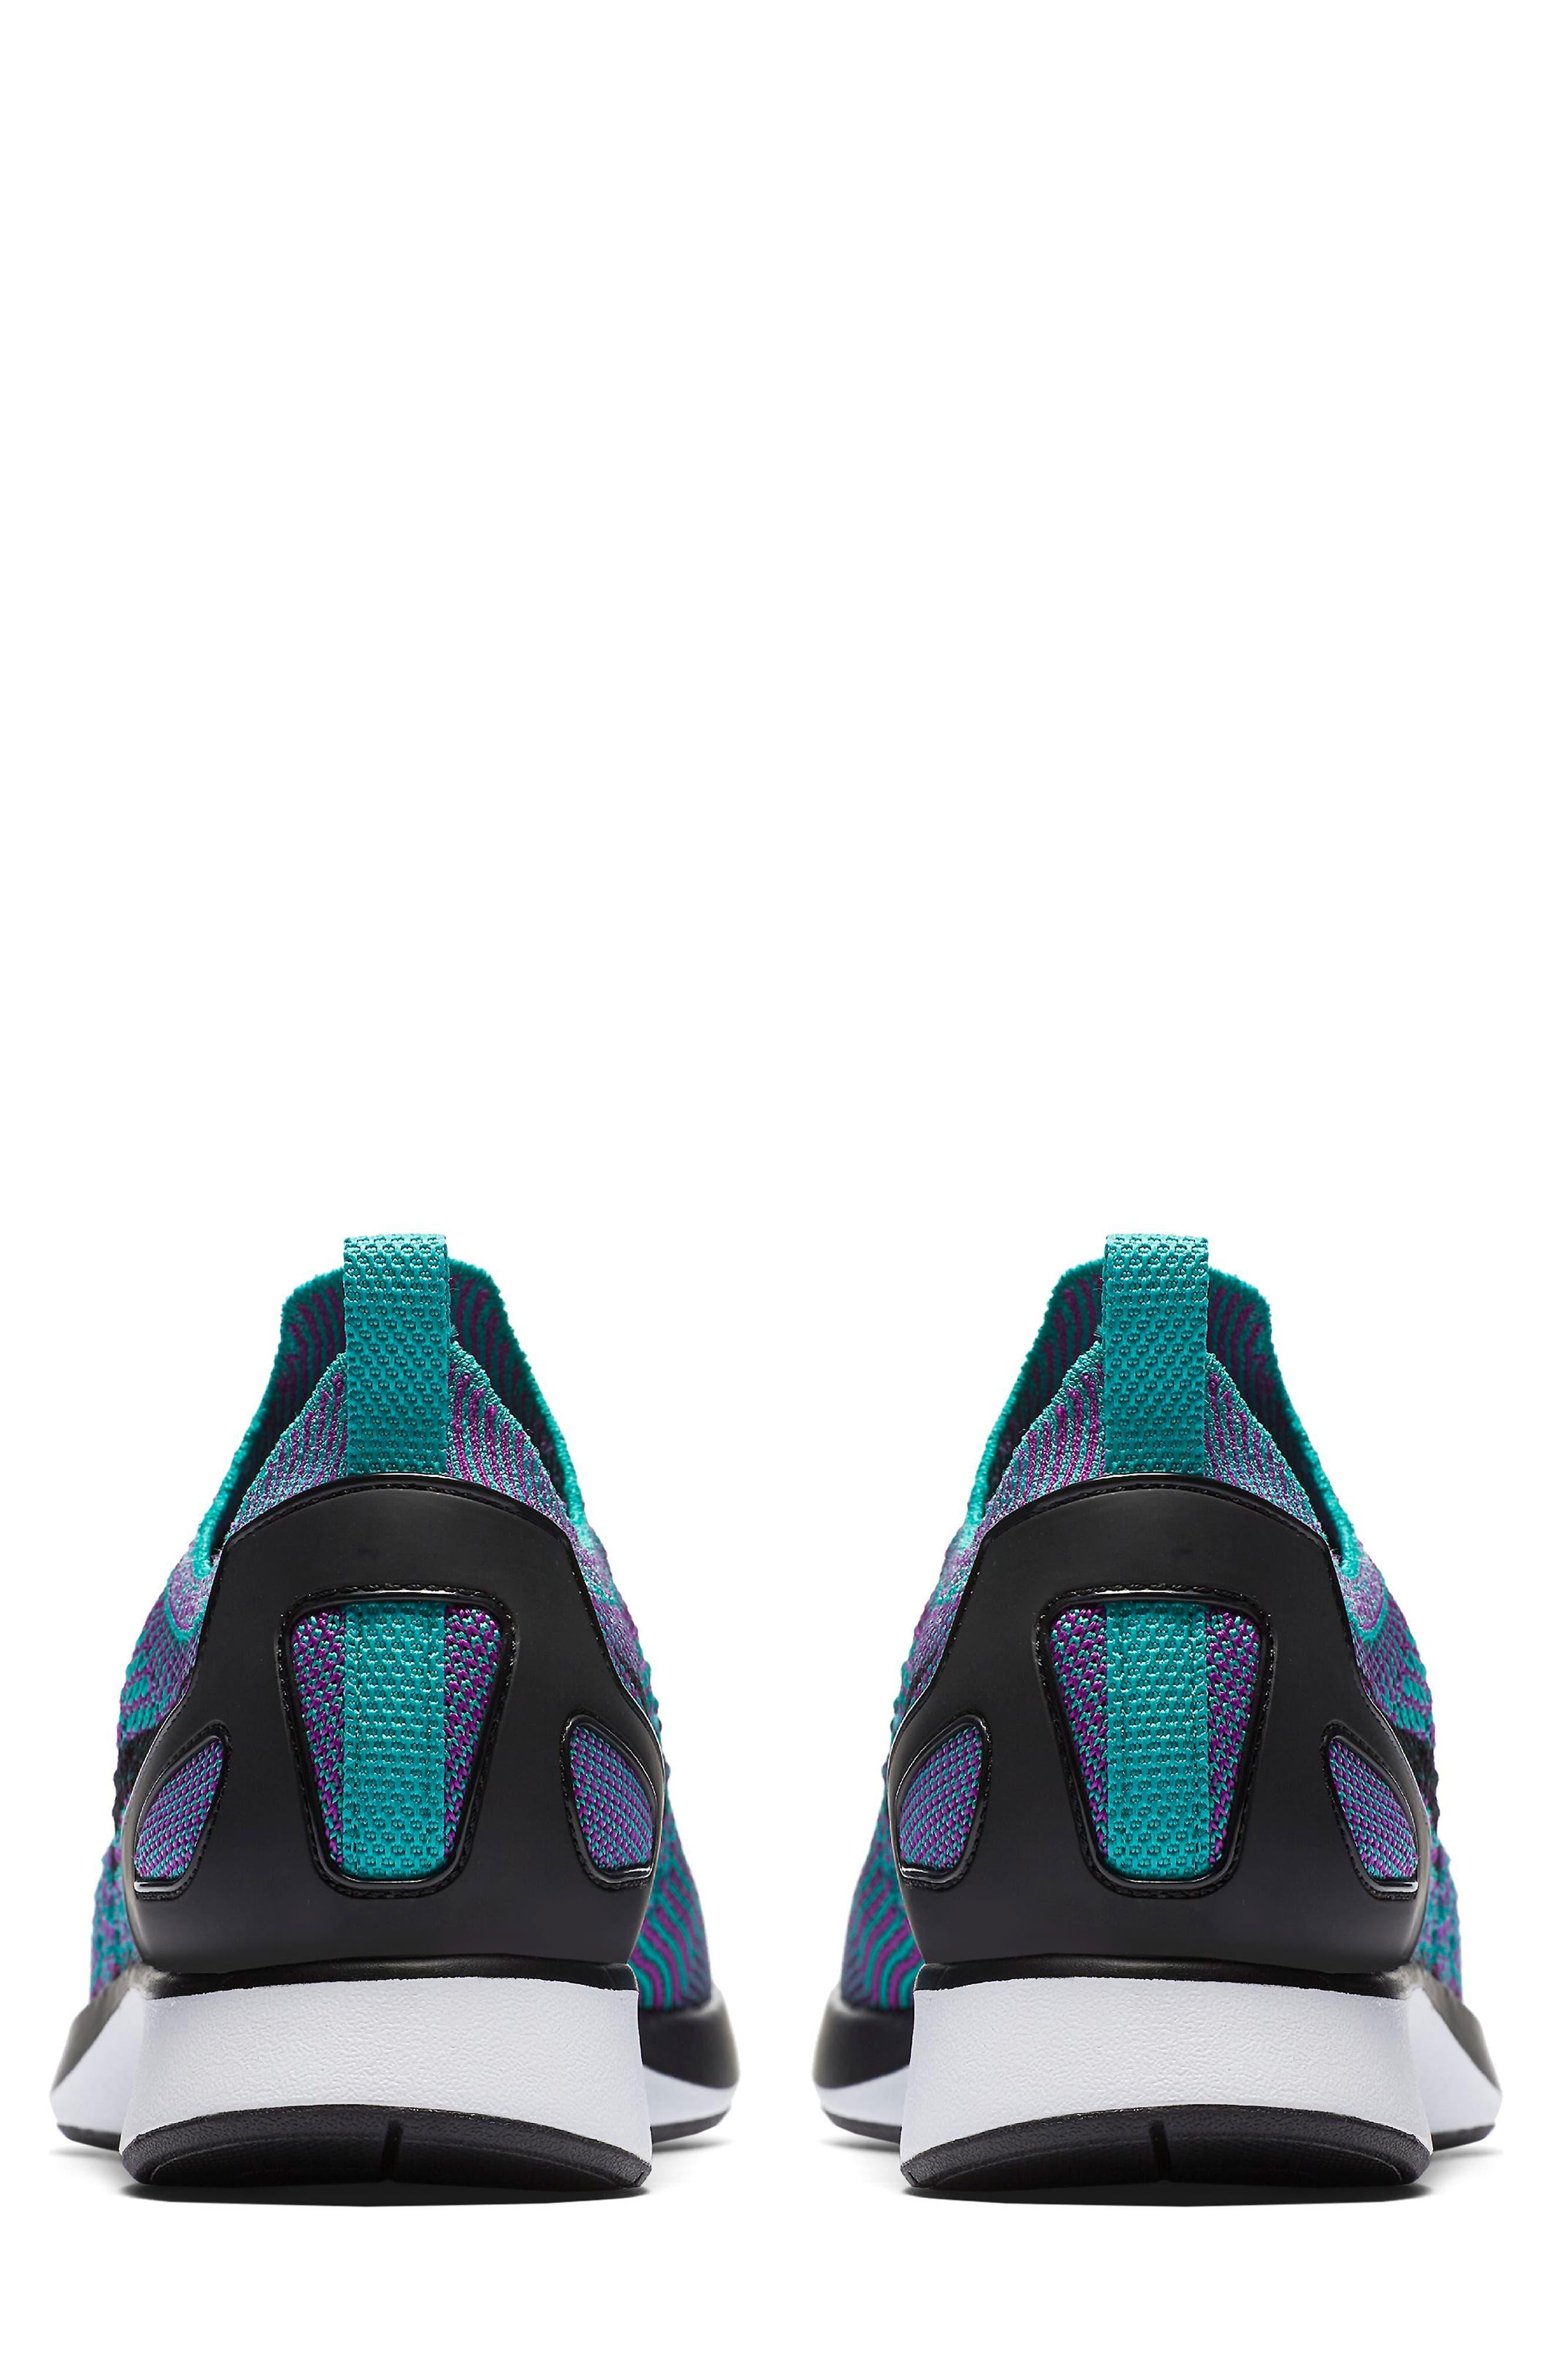 Air Zoom Mariah Flyknit Racer Sneaker,                             Alternate thumbnail 2, color,                             CLEAR JADE/ BLACK